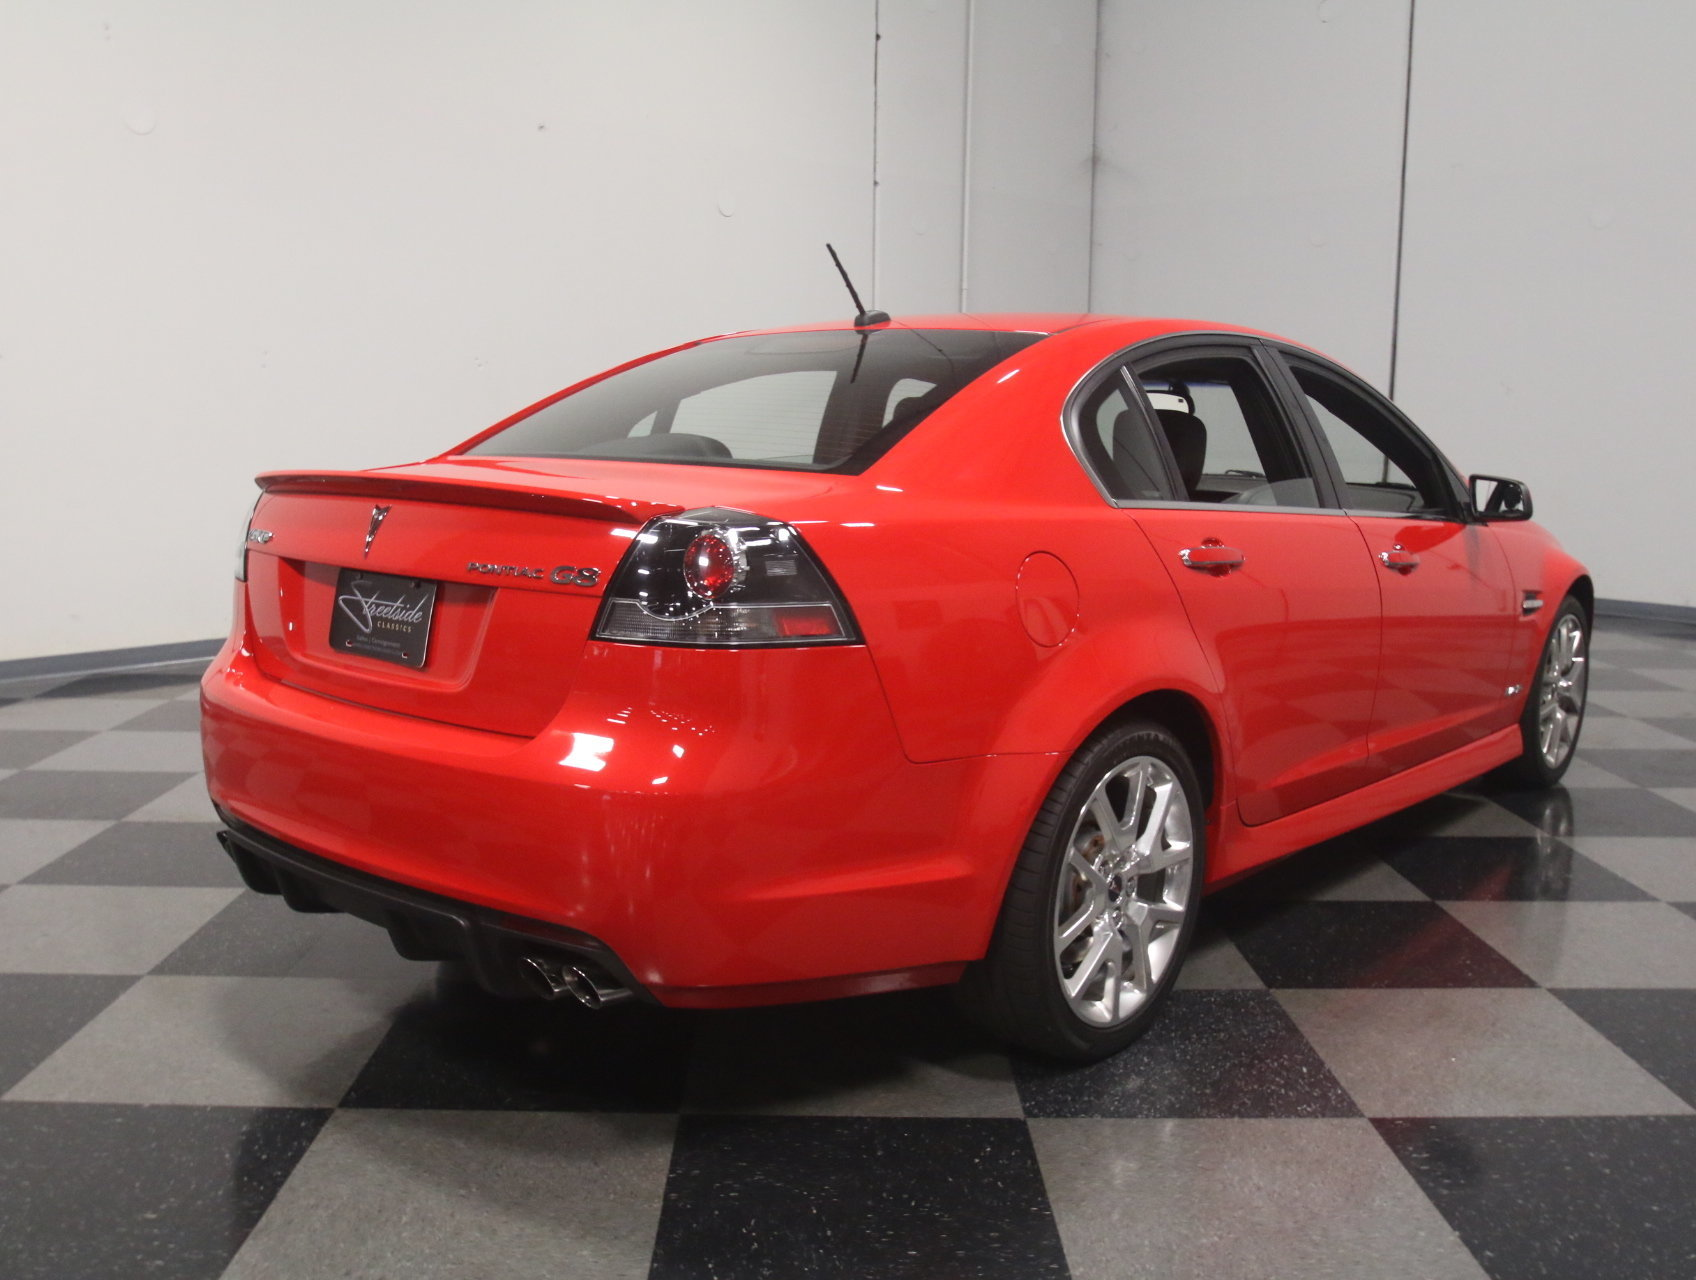 2009 Pontiac G8 Gt For Sale >> 2009 Pontiac G8 GXP for sale #67836   MCG